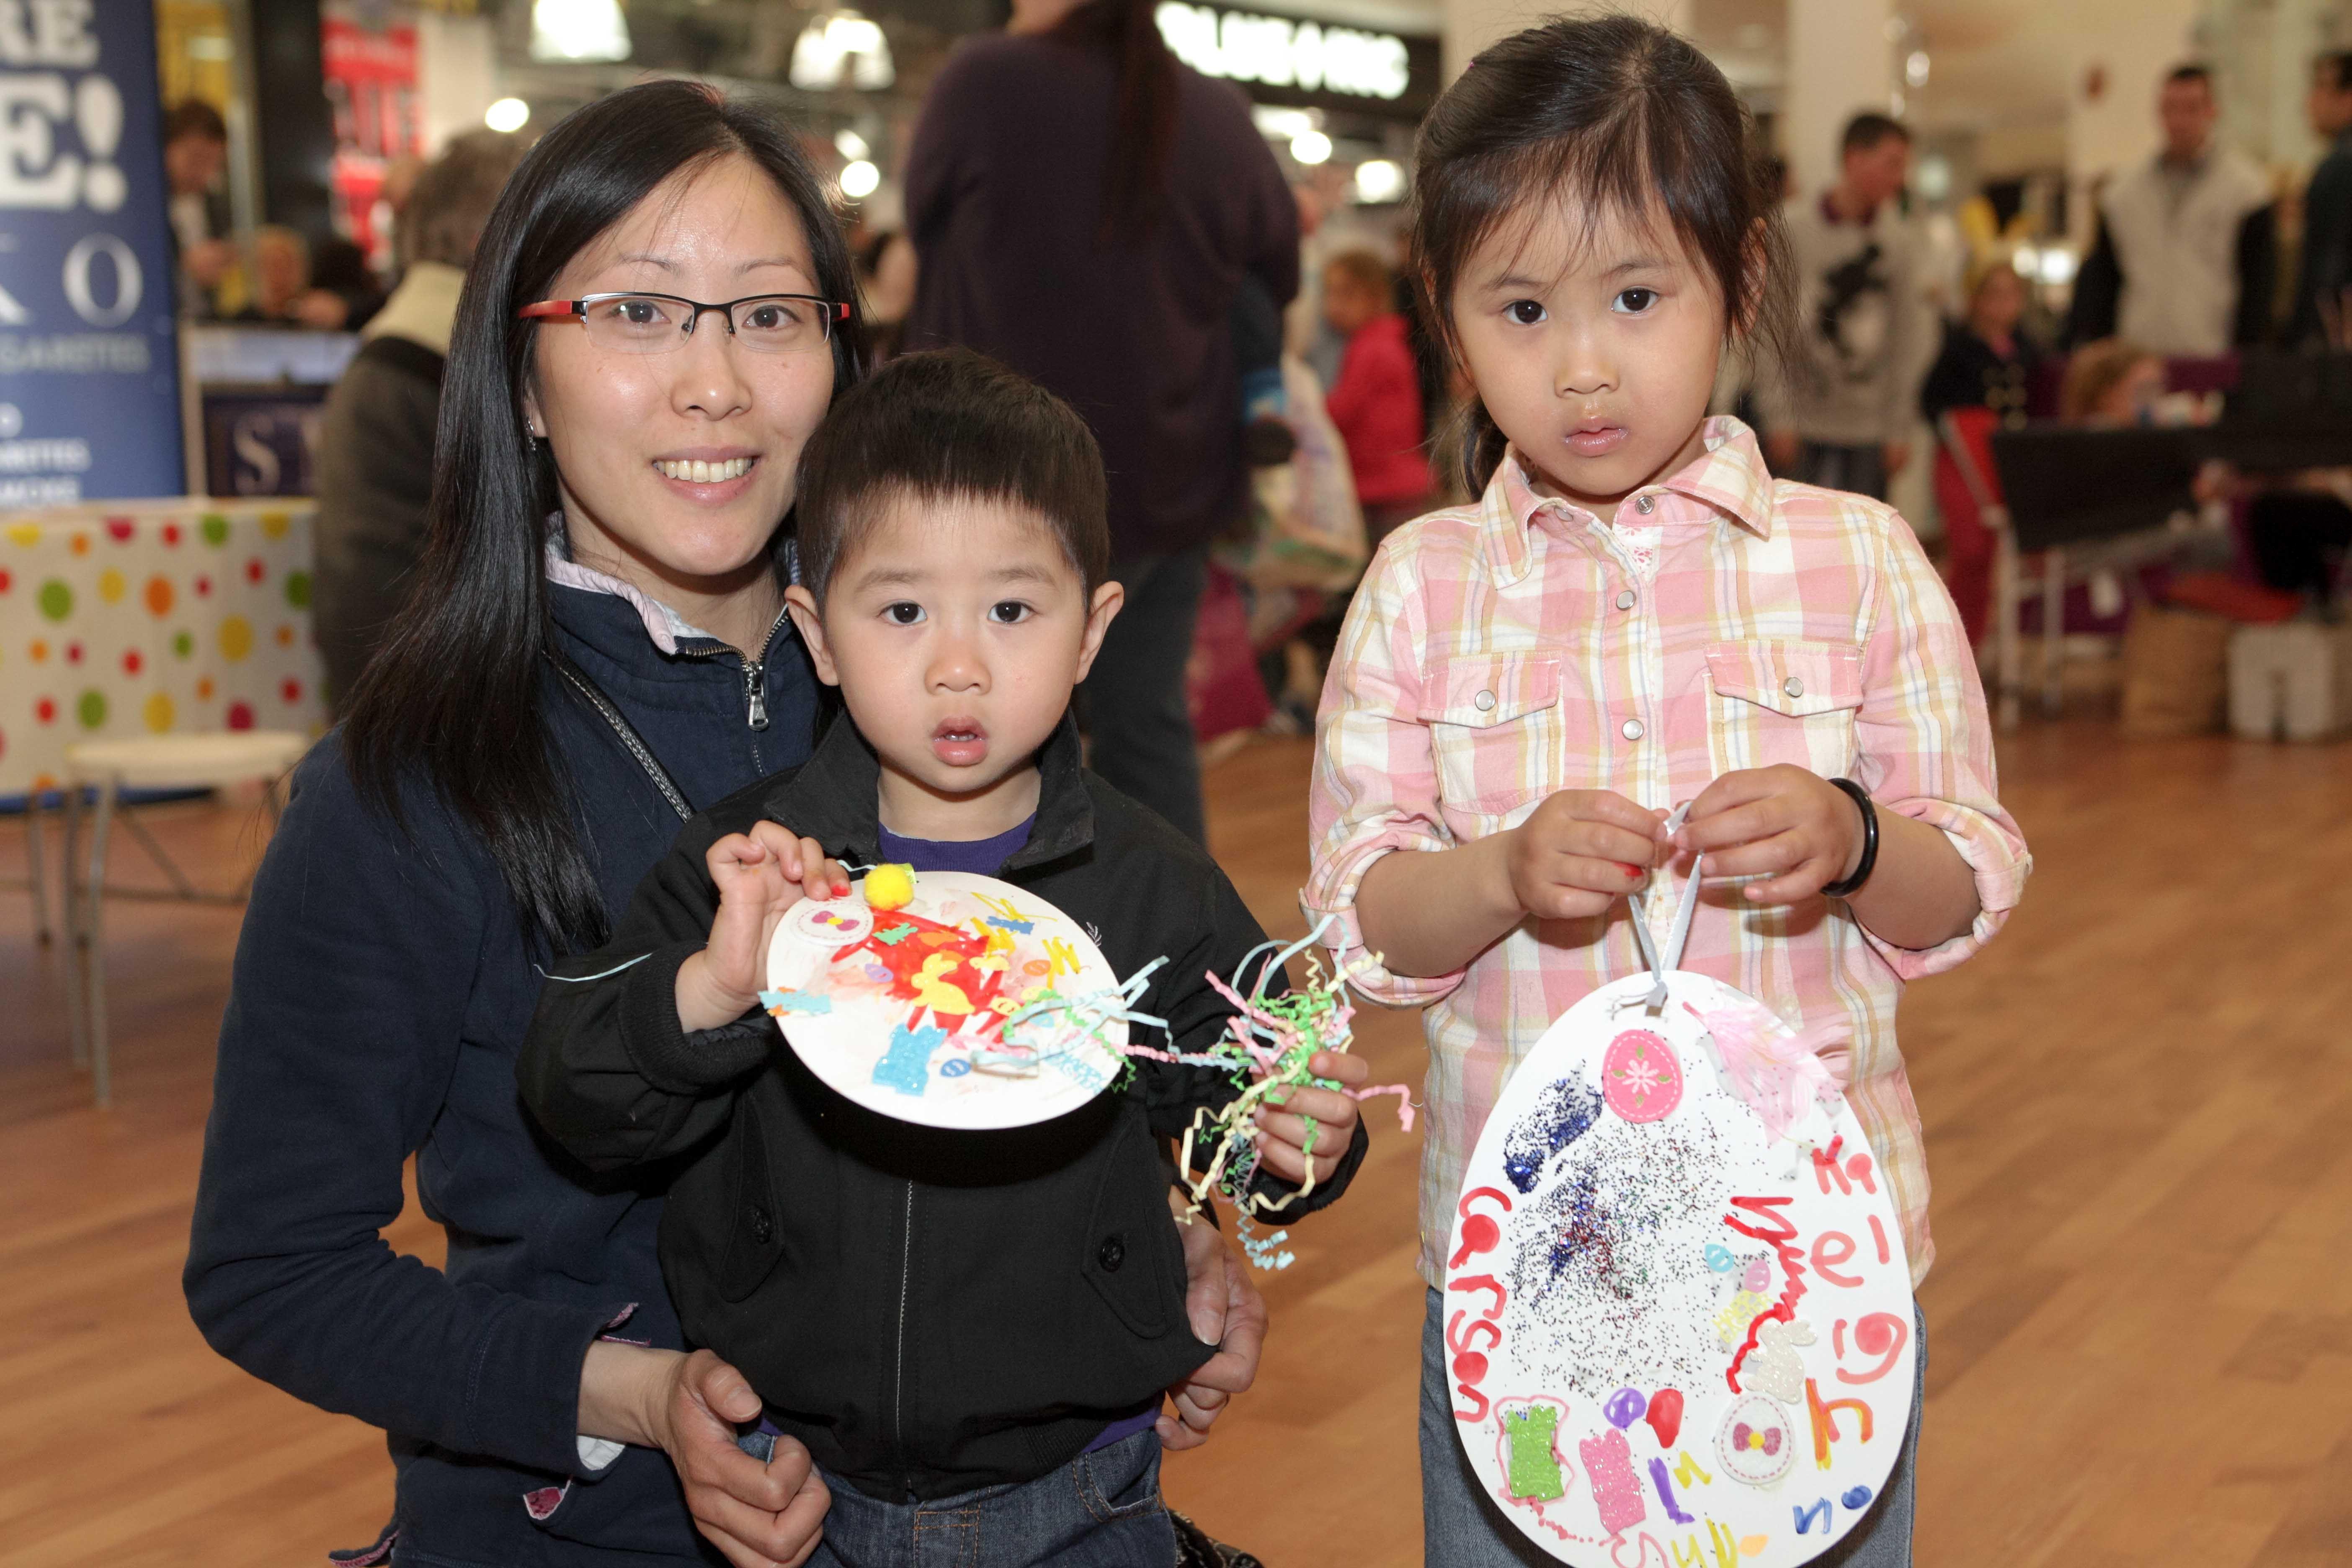 #Easter fun at The Harvey Centre 2014. #KidsClub #EasterFun #Shopping #Harlow #Essex #Events #Kids #Fun